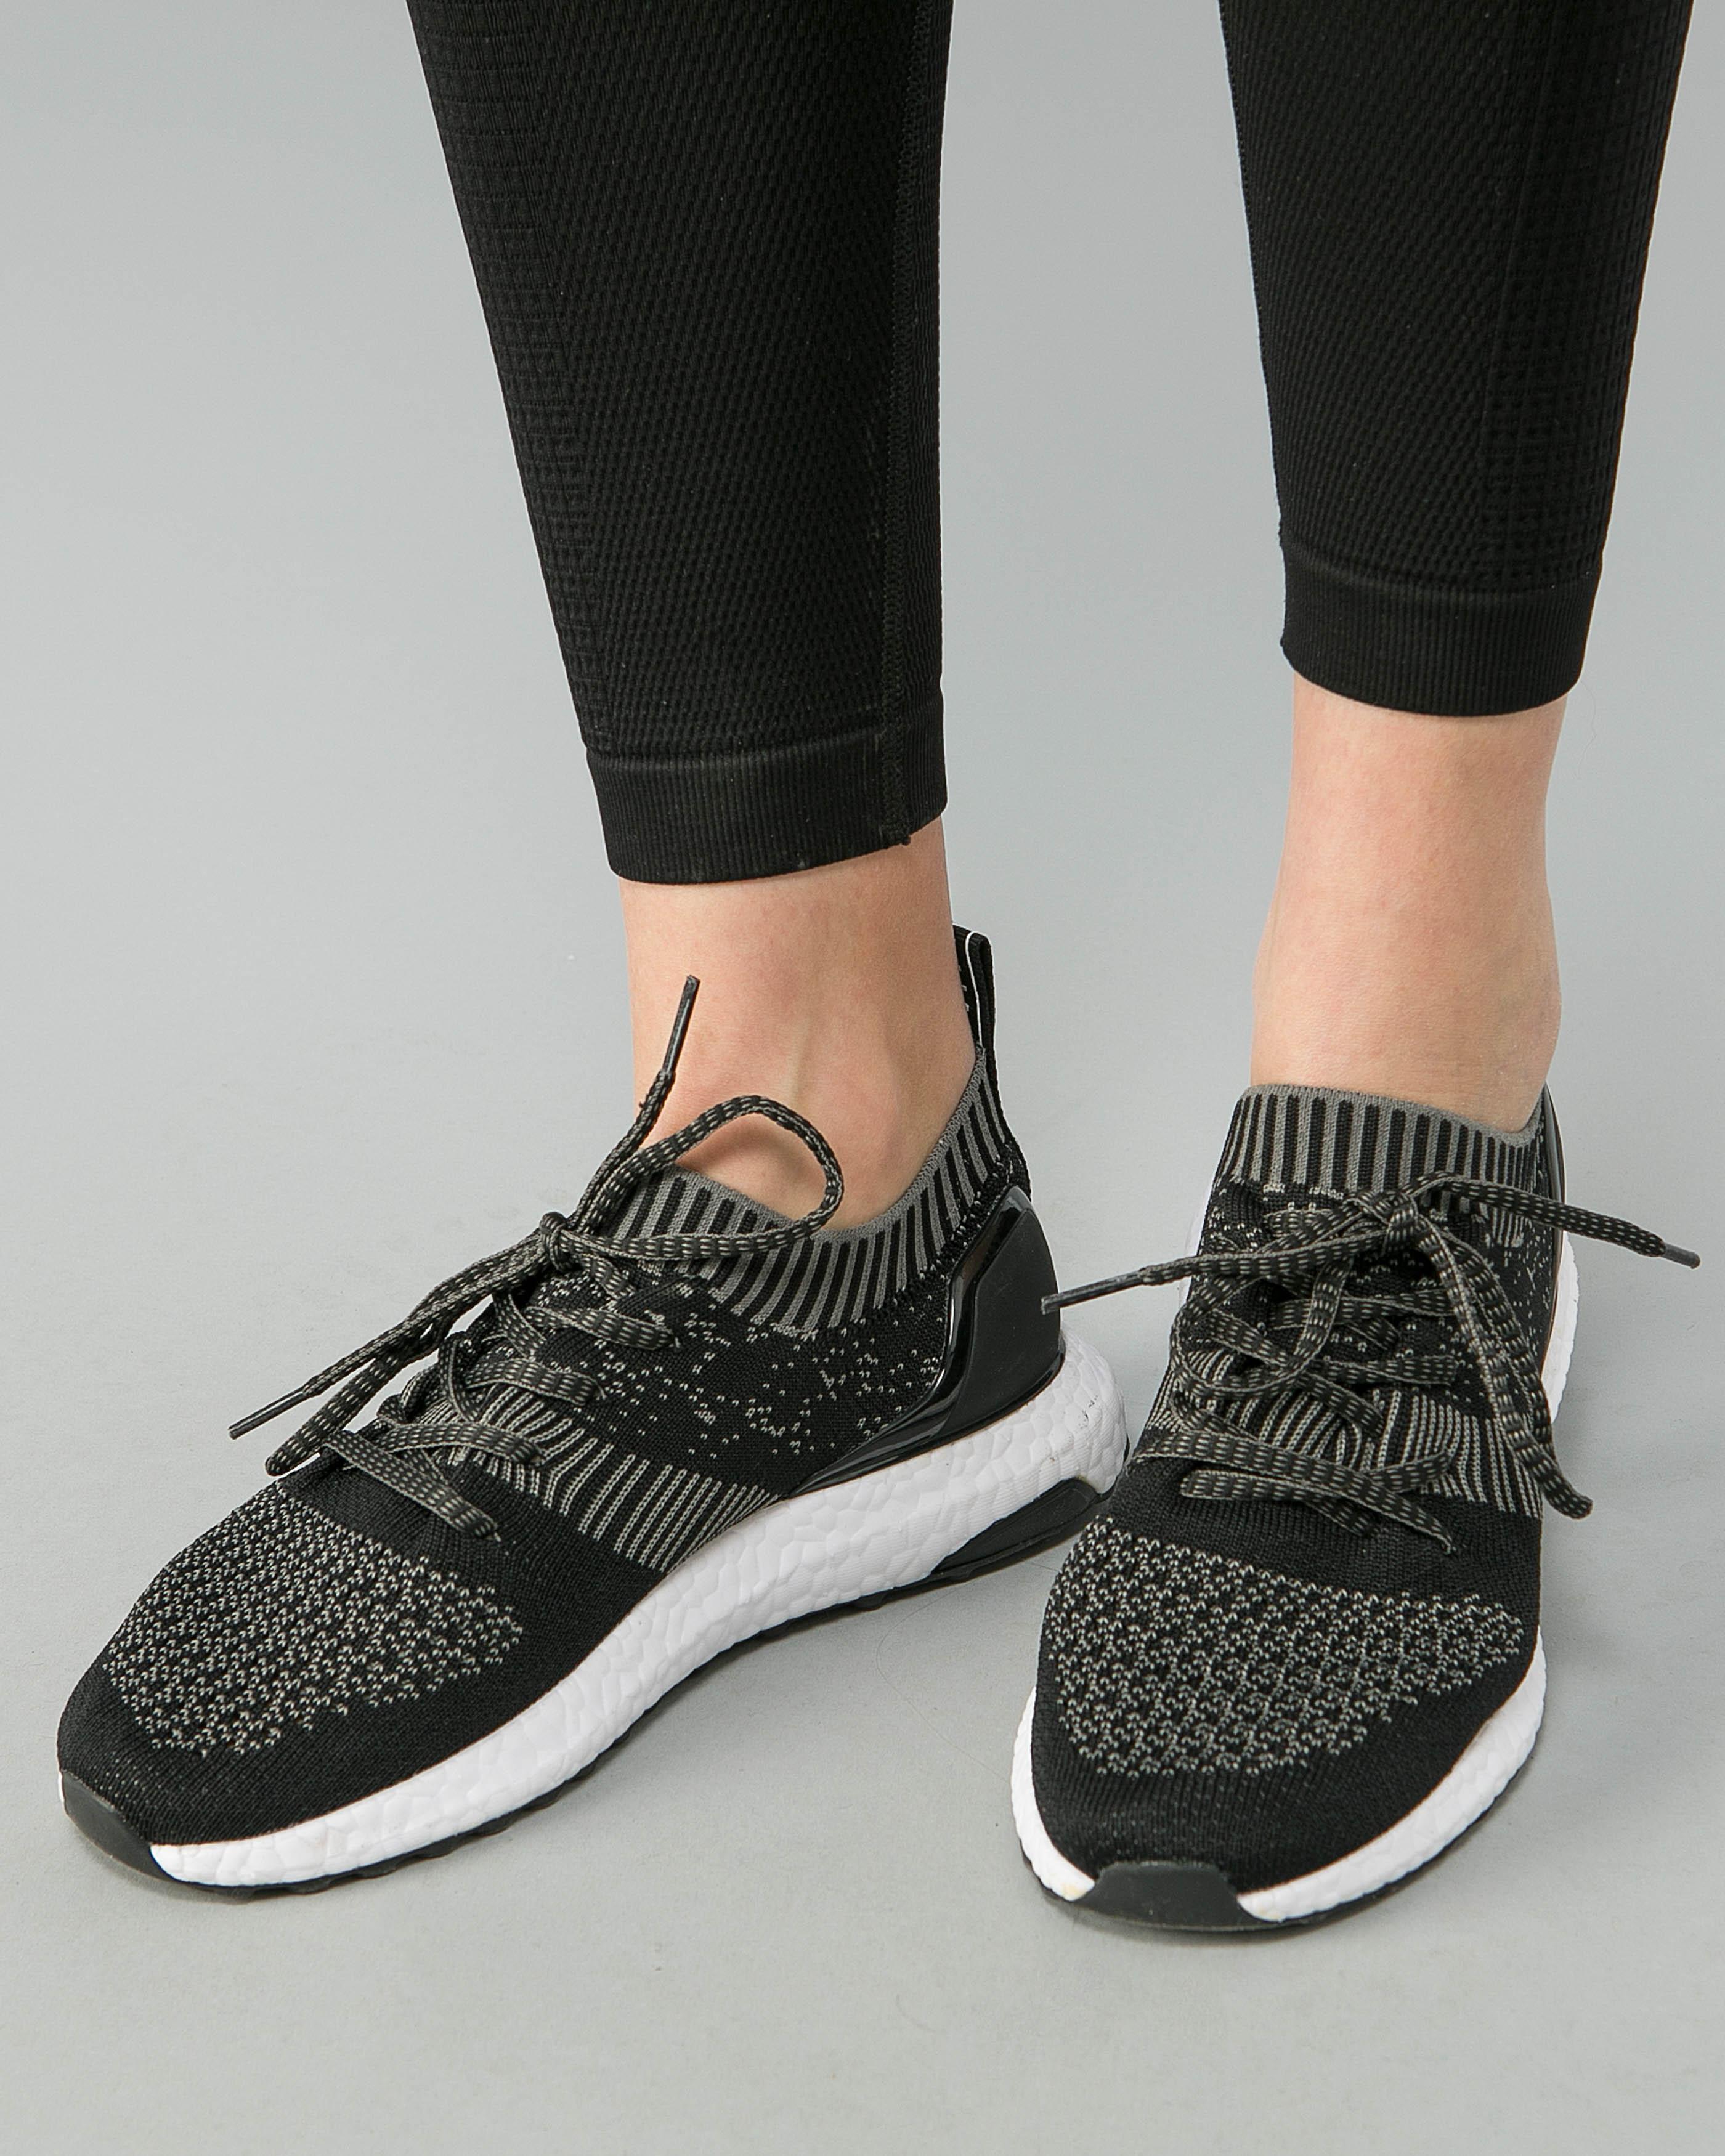 LEVITY Premium Fitness Joggesko Black Tights.no